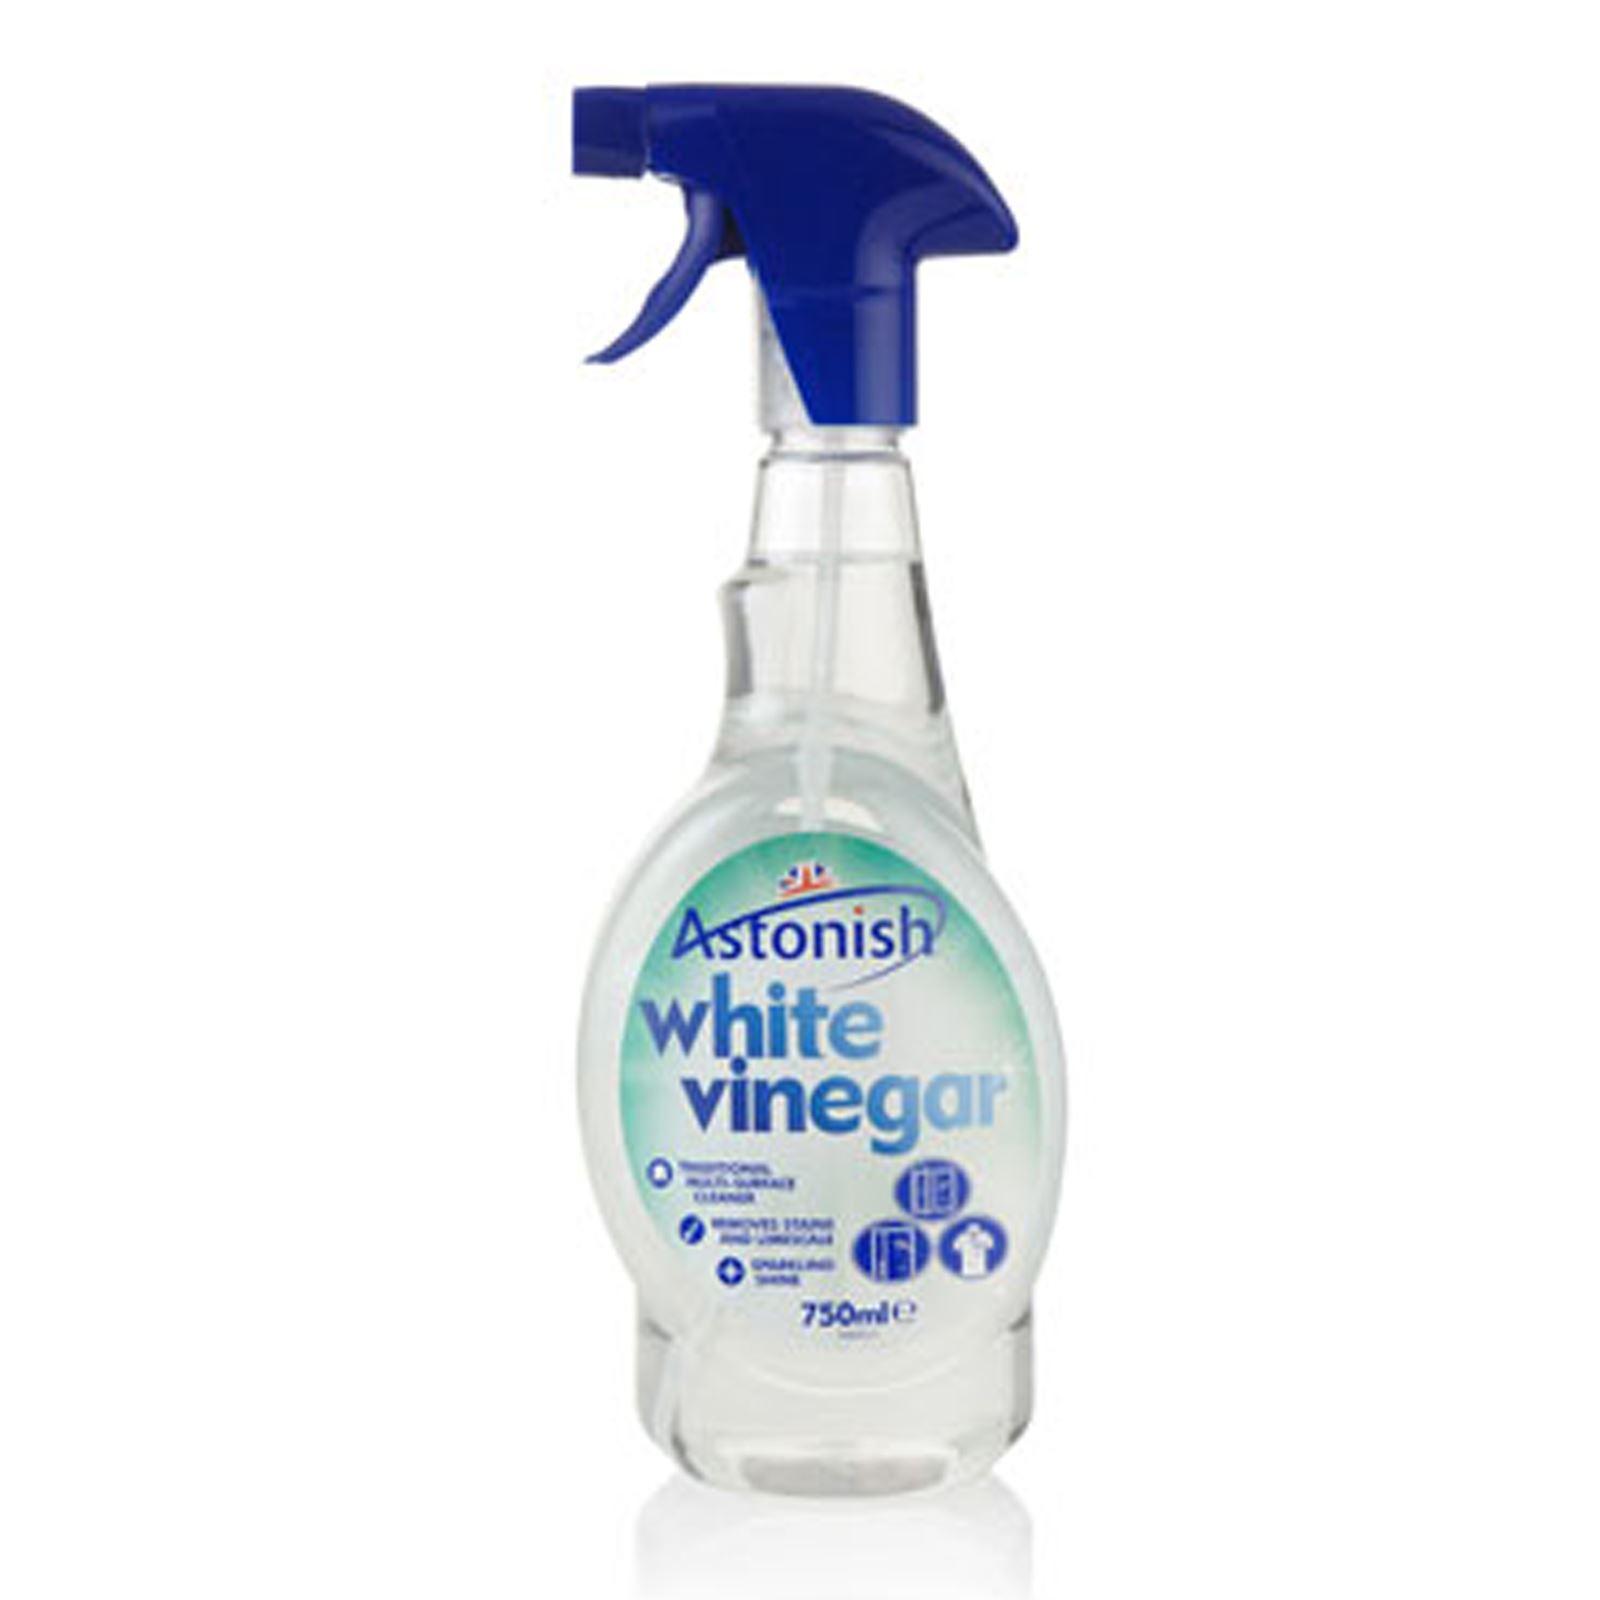 Astonish Cleaner: Astonish Cleaner Spray Bathroom Kitchen Antibacterial